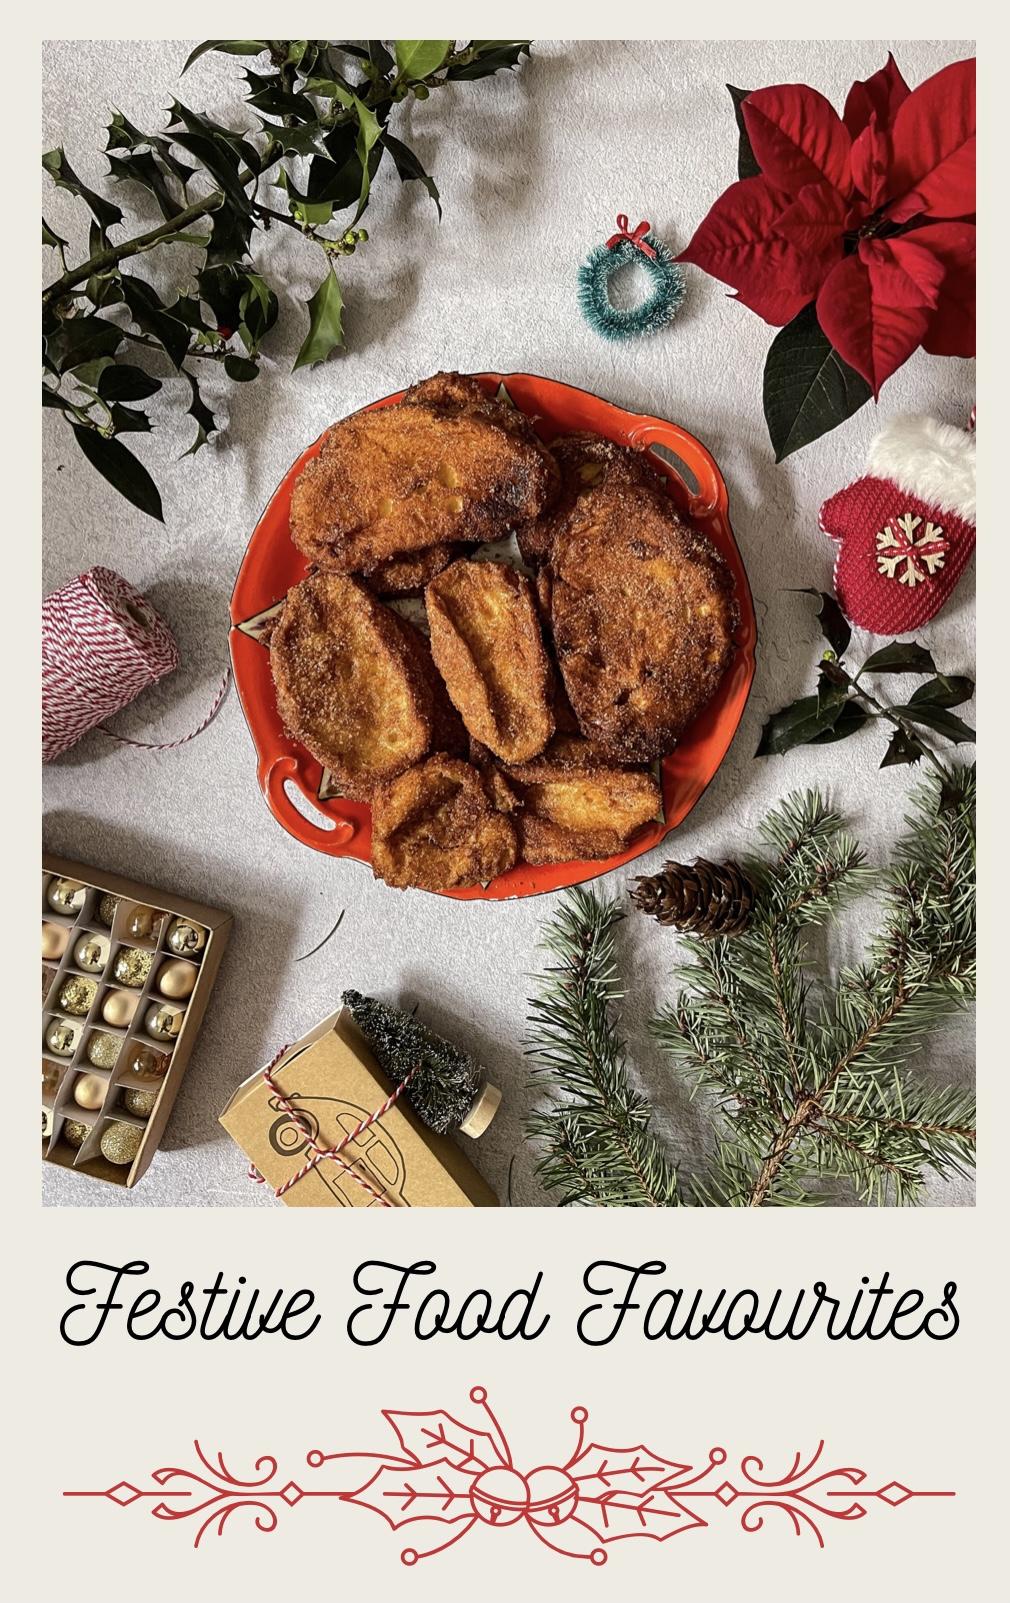 Festive Food Favourites